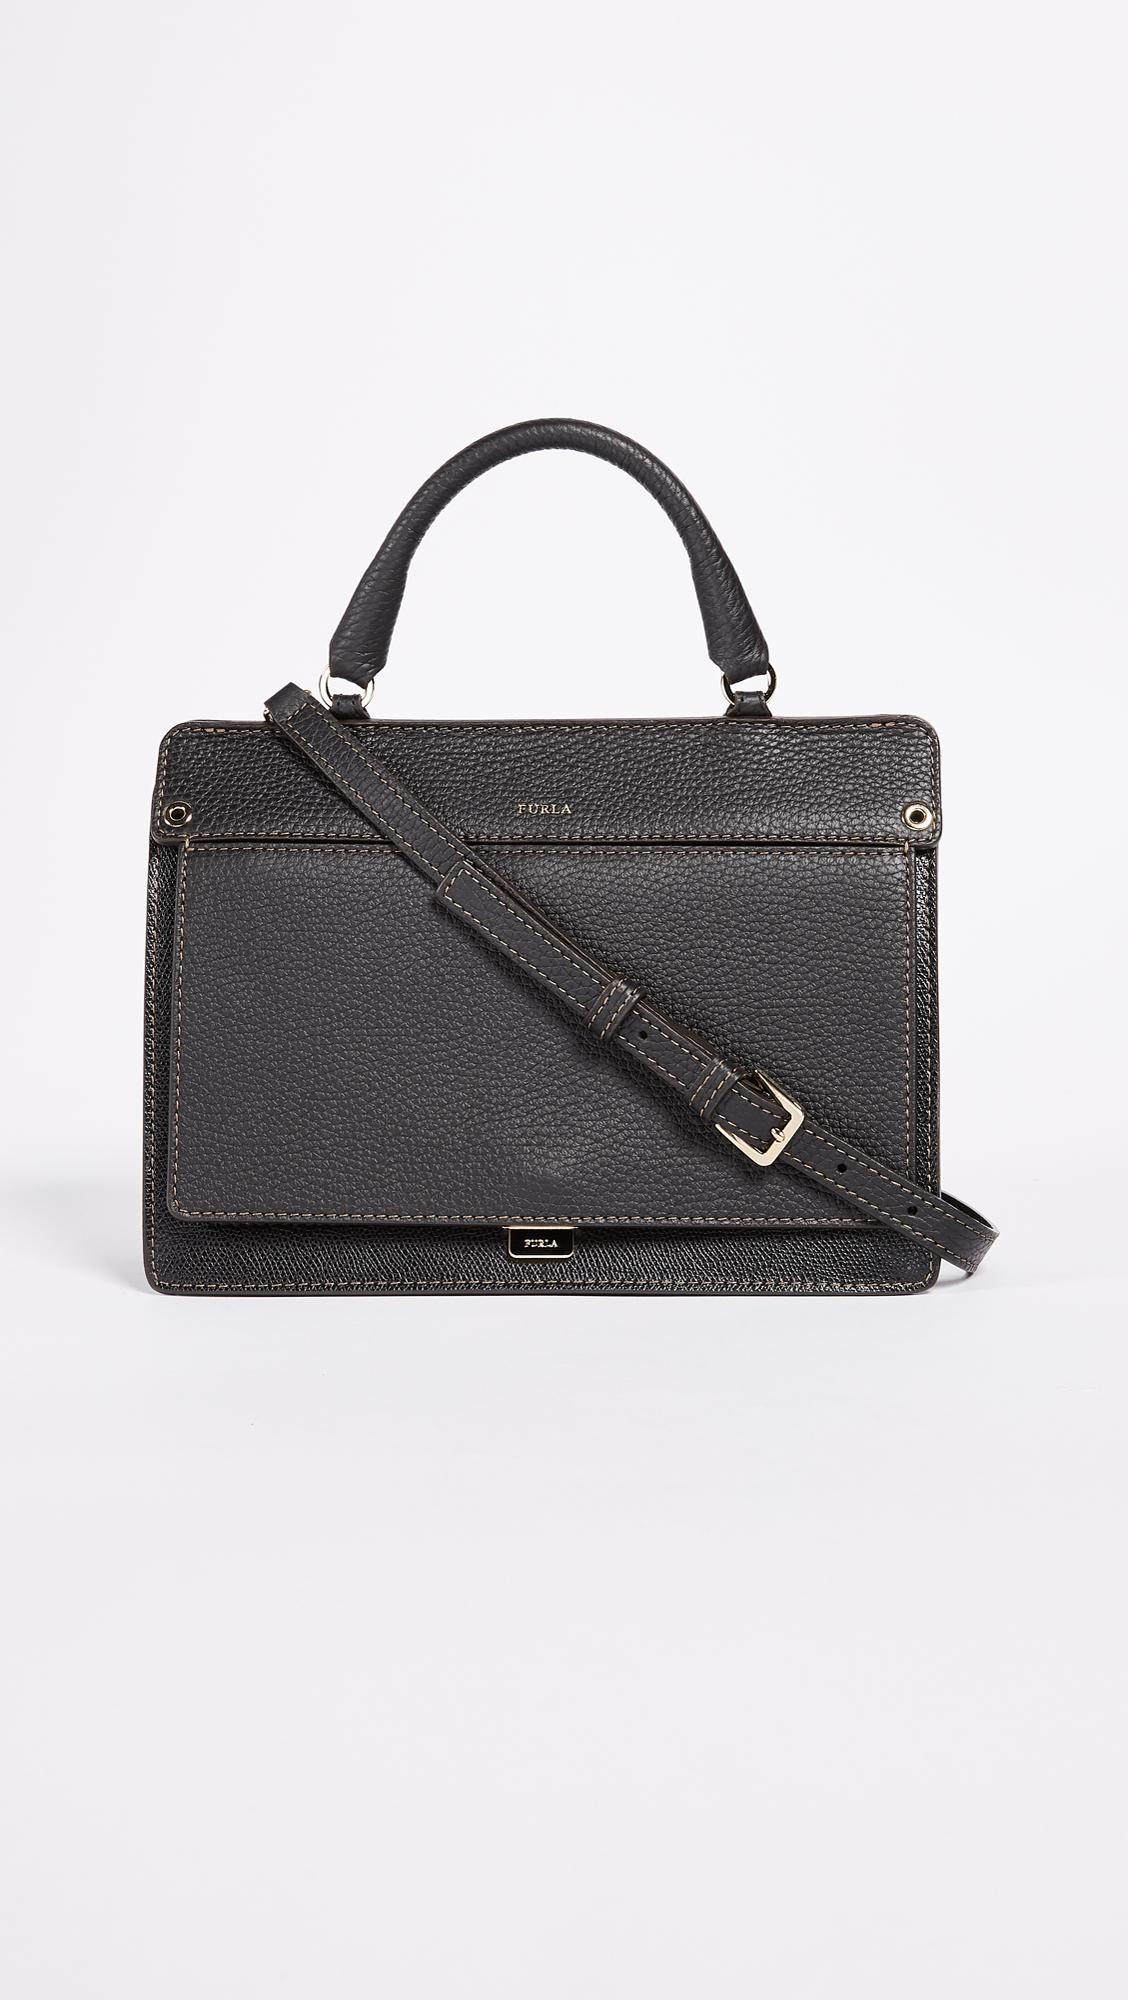 9aab1cf36a349 Lyst - Furla Like Small Top Handle Bag in Black